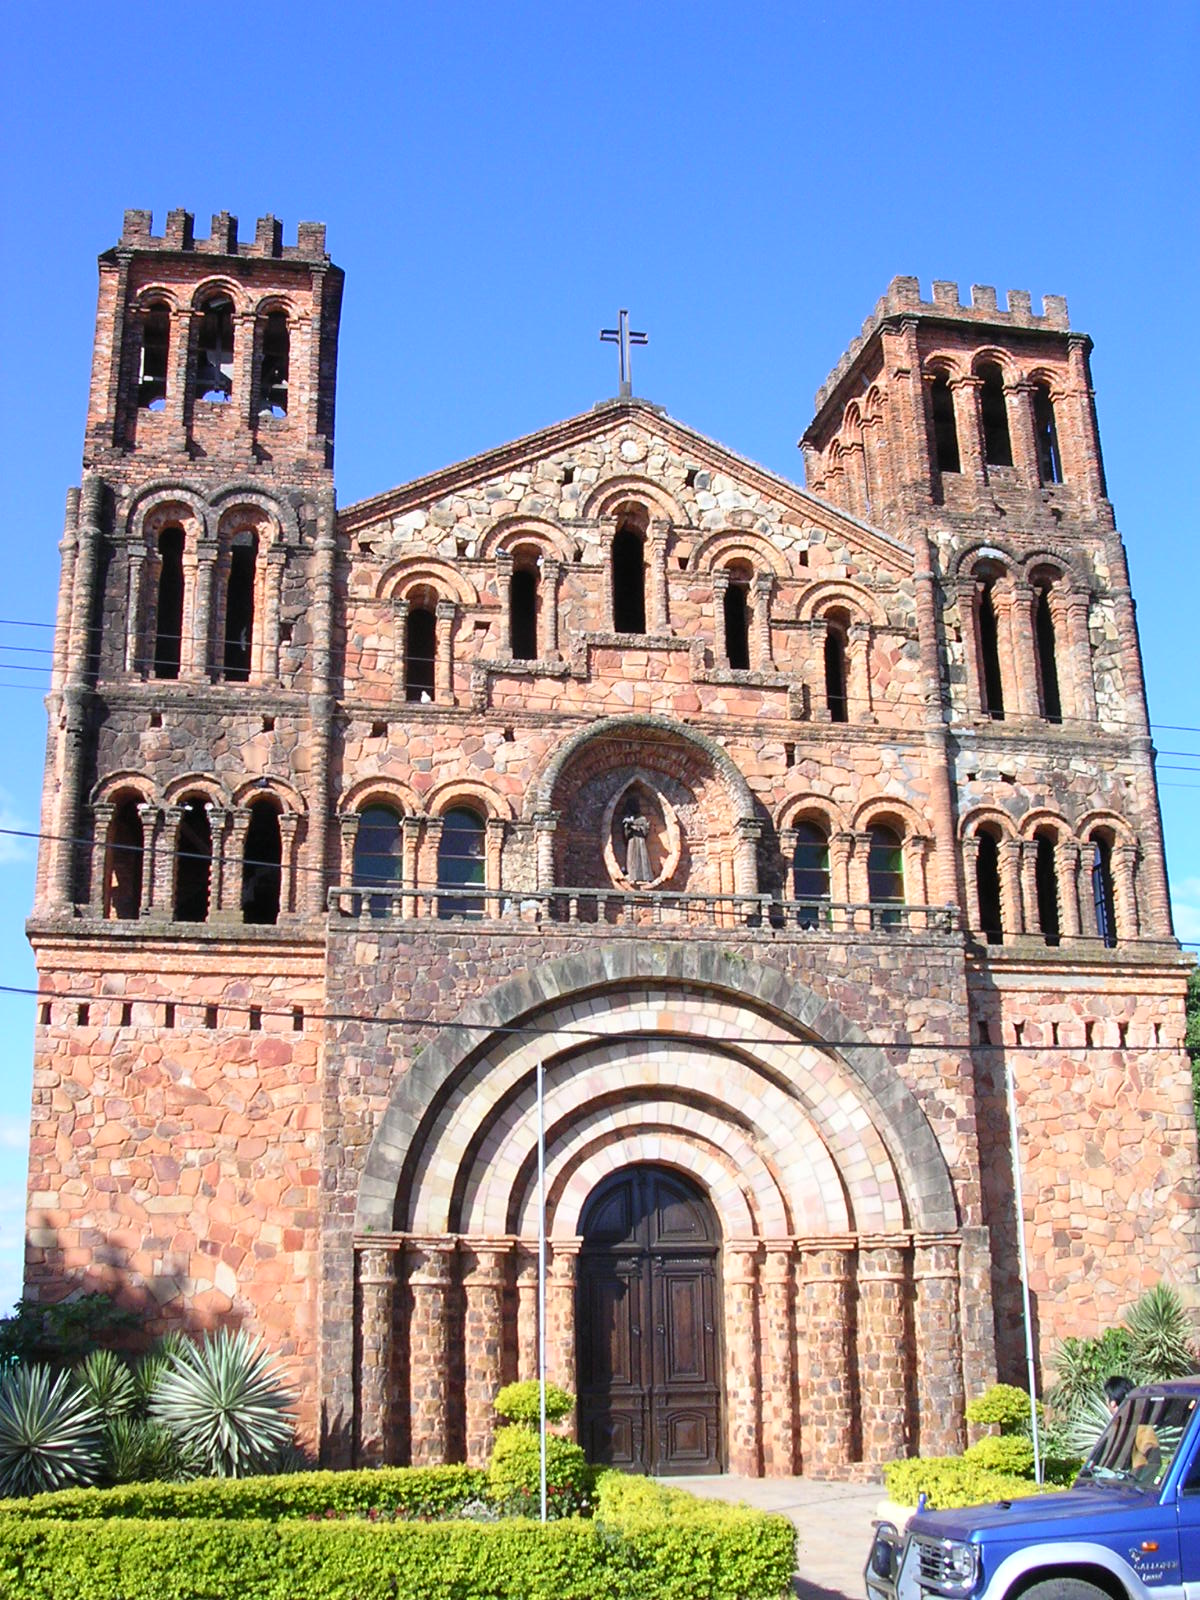 Villarica ciudad cultural de paraguay ser turista for Arquitectura wikipedia